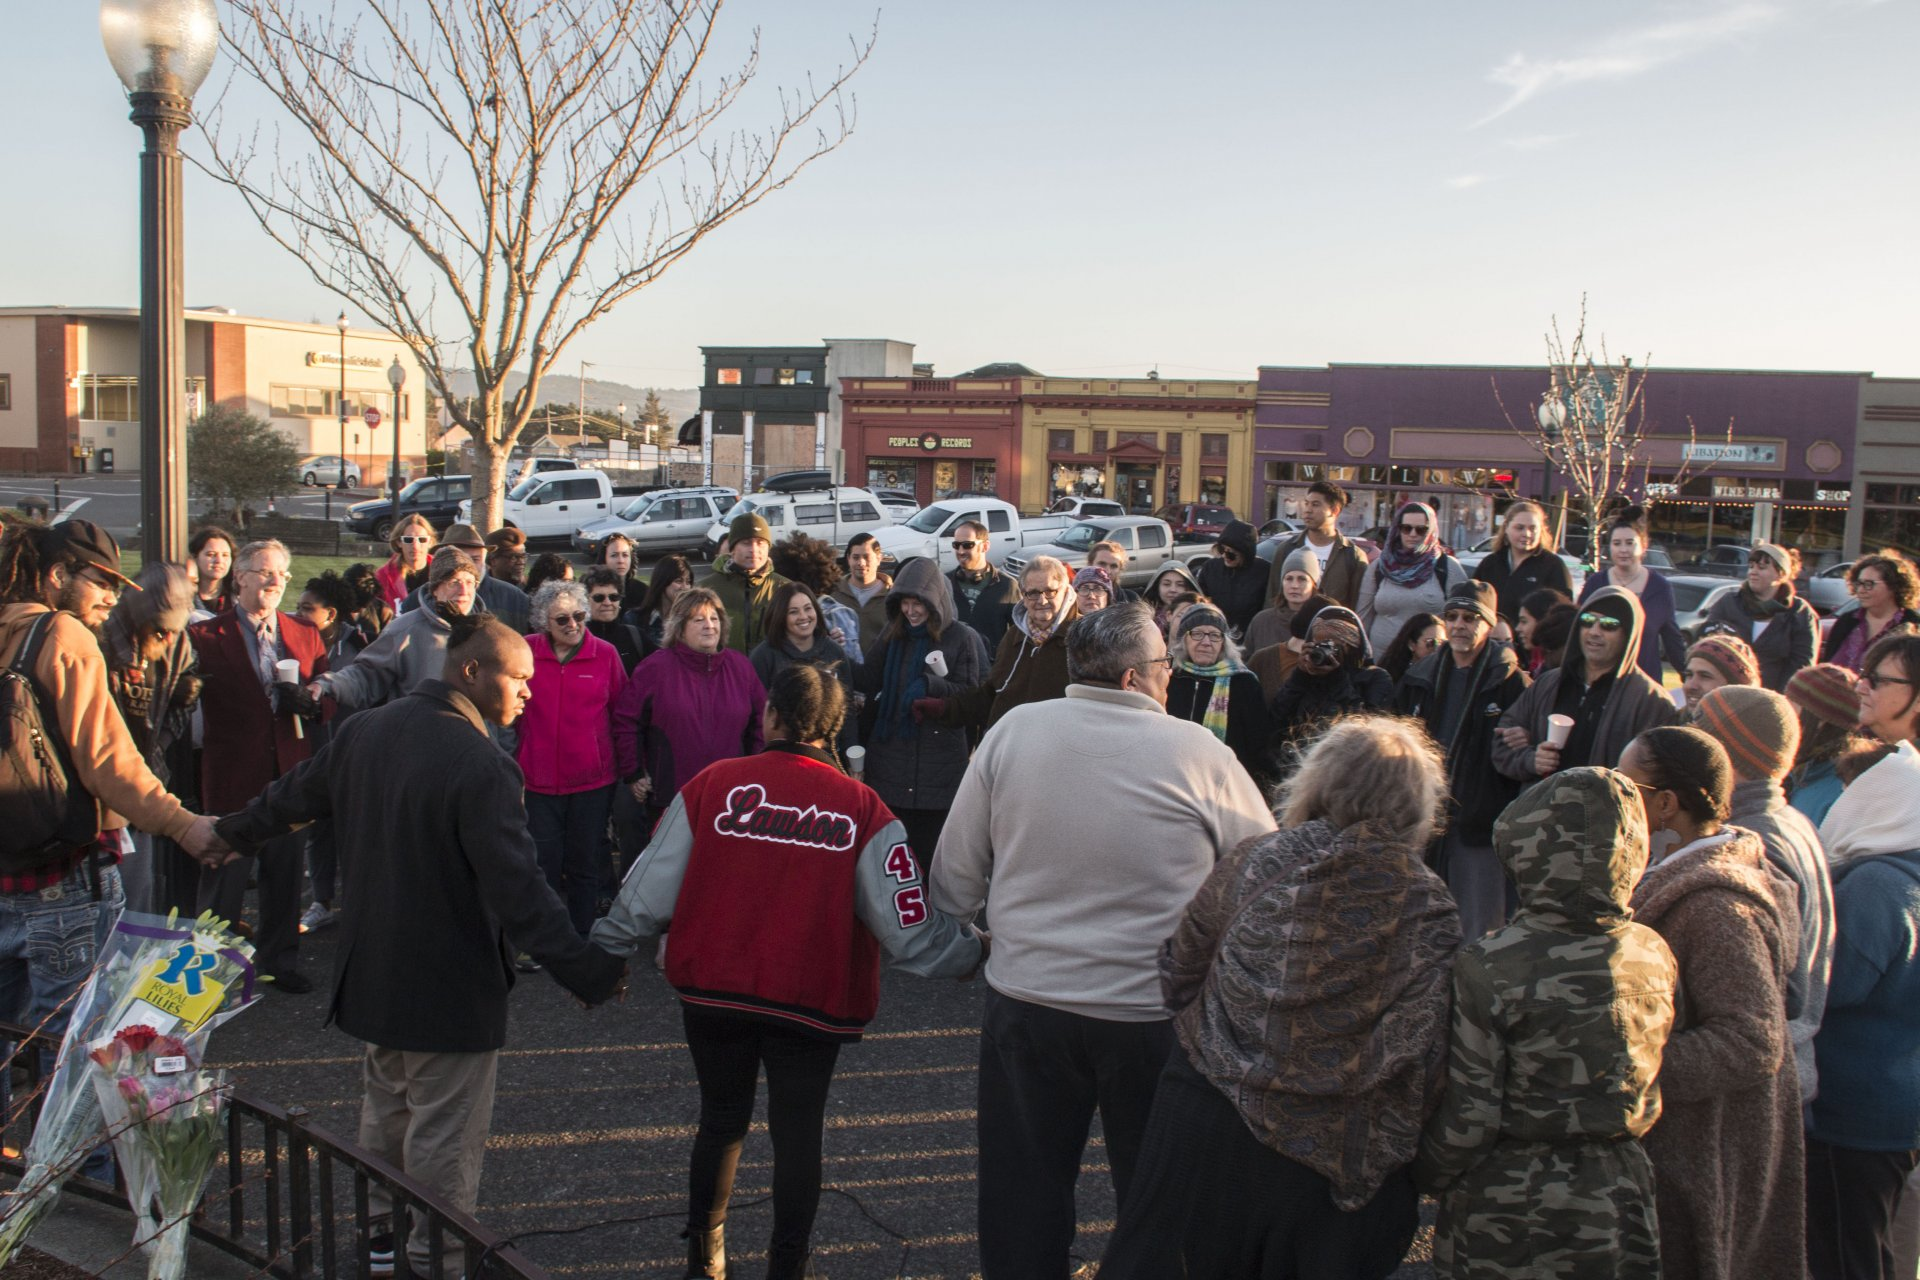 Supporters beginning a prayer at David Josiah Lawson's vigil on Feb 15 at the Arcata Plaza. Photo by Bailey Tennery.